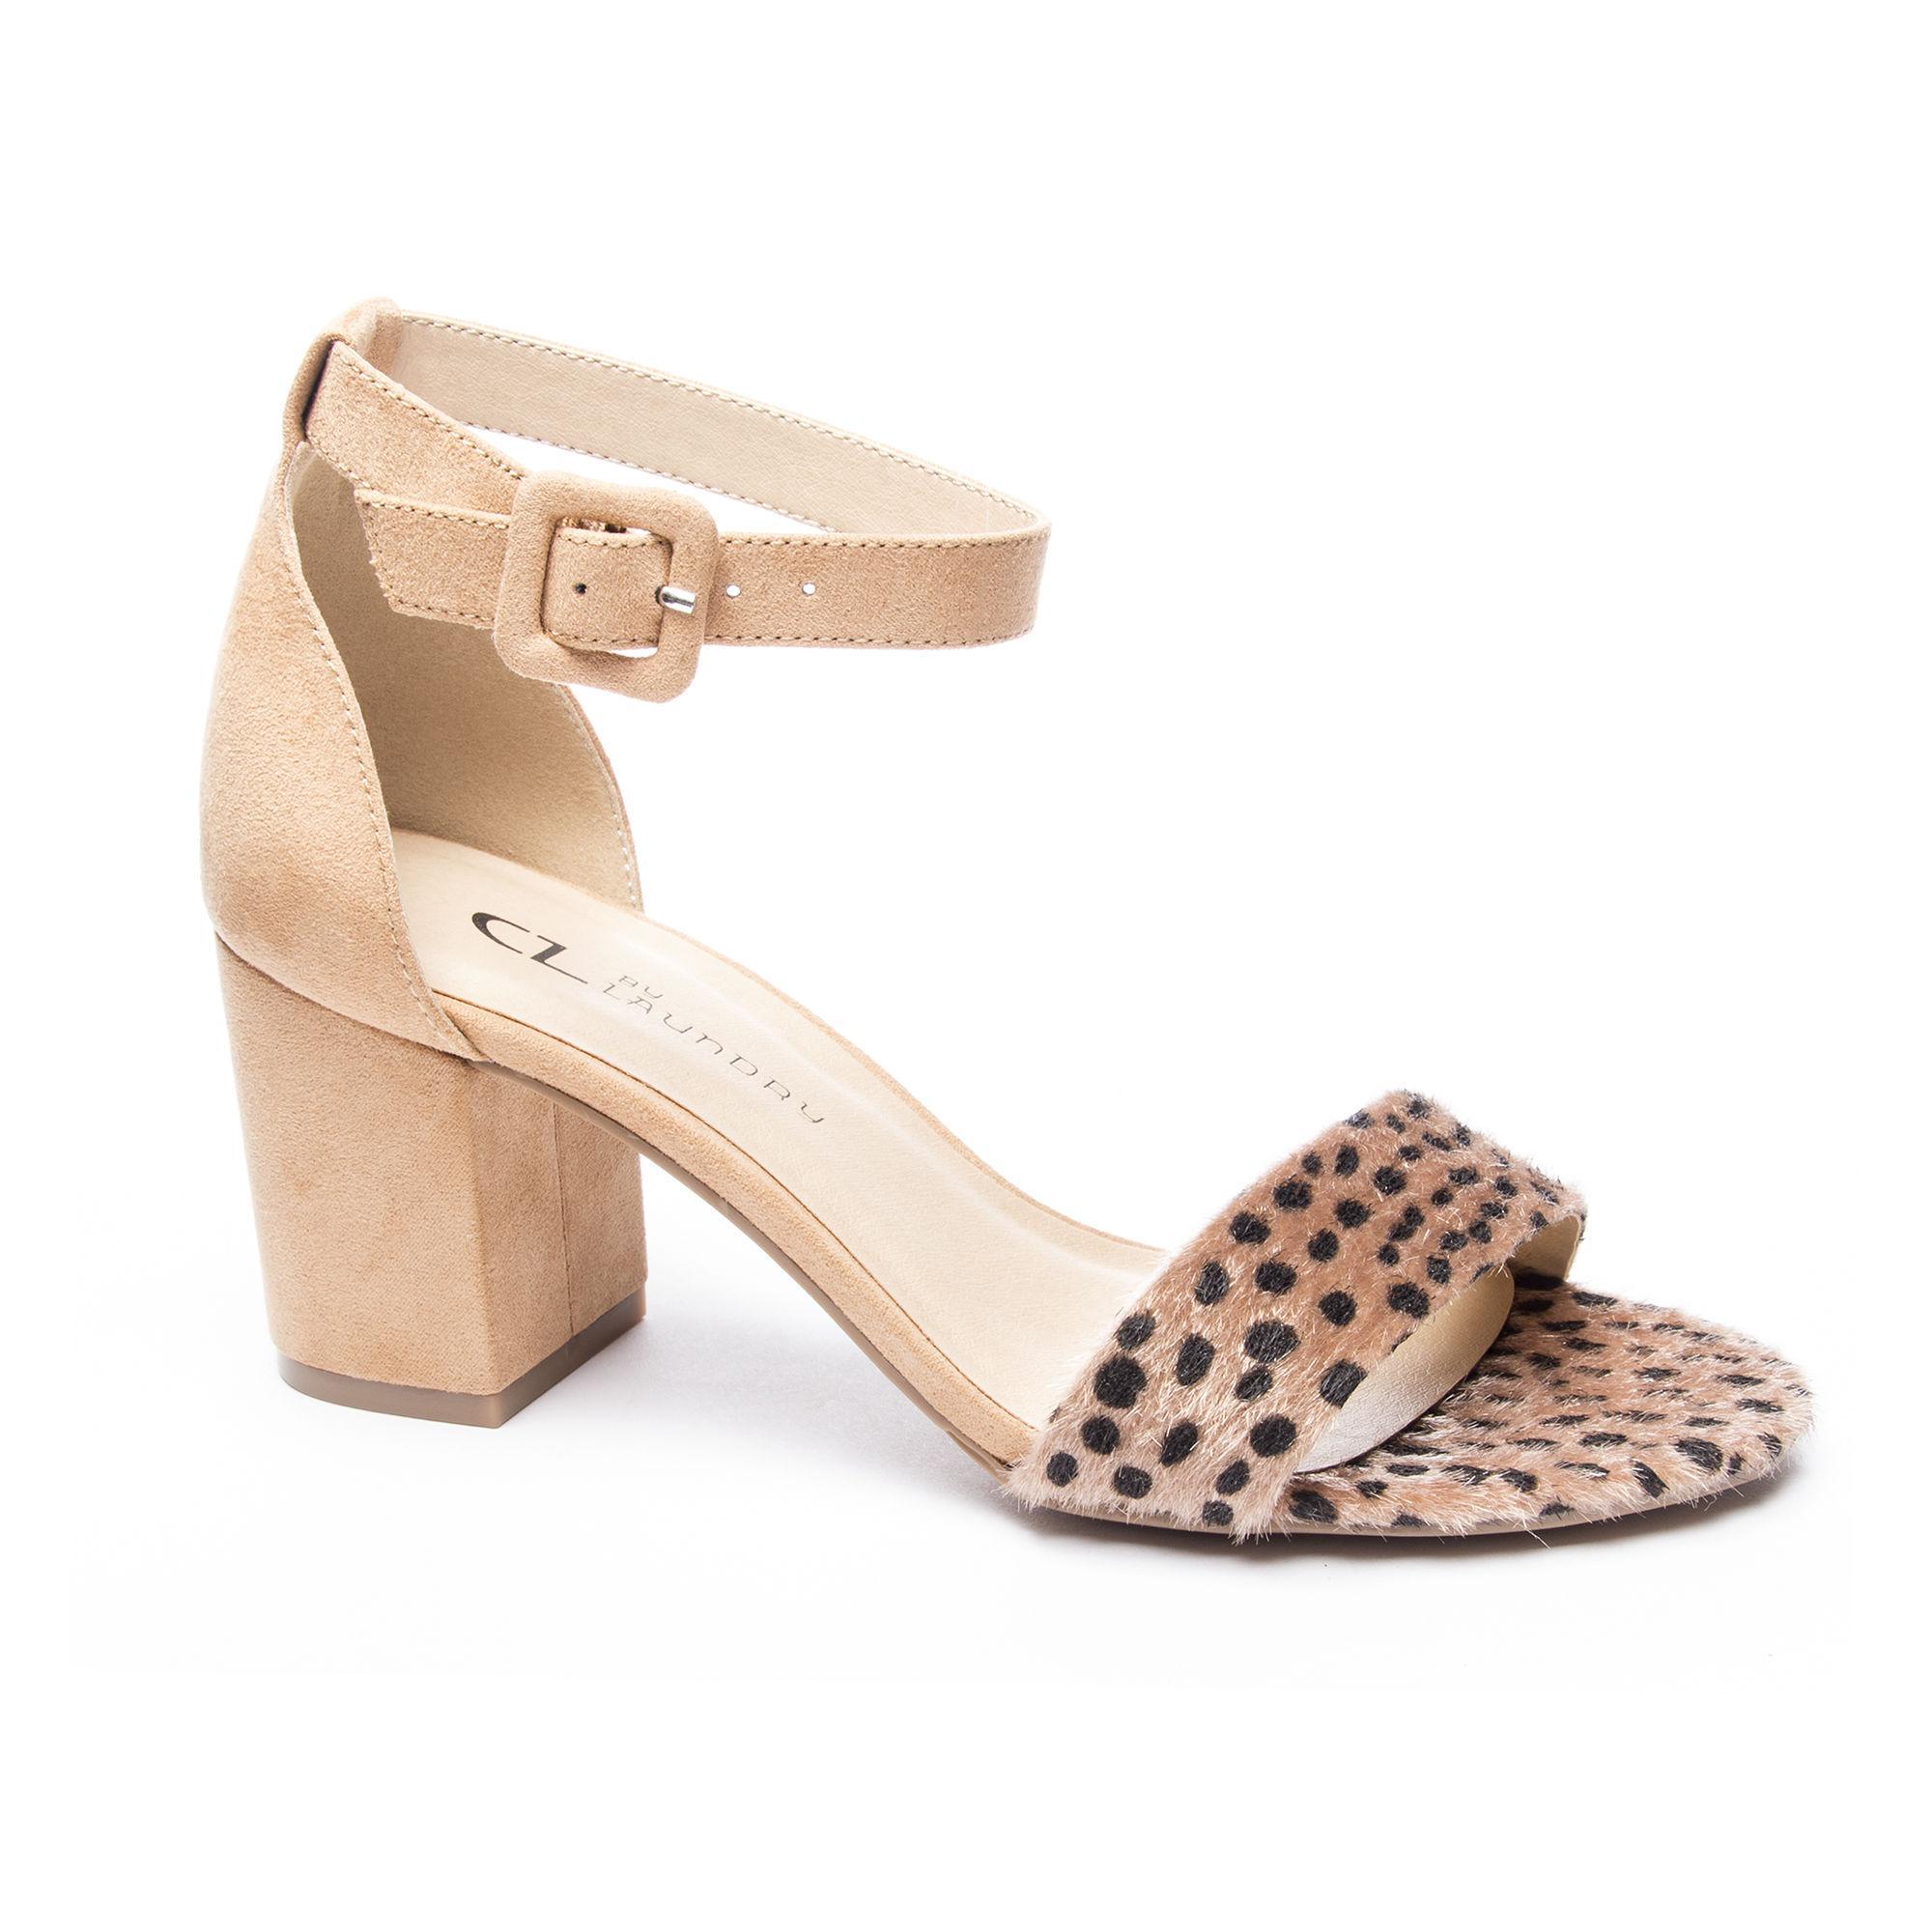 1fc35b50dcd Lyst - Chinese Laundry Jody Block Heel Sandal